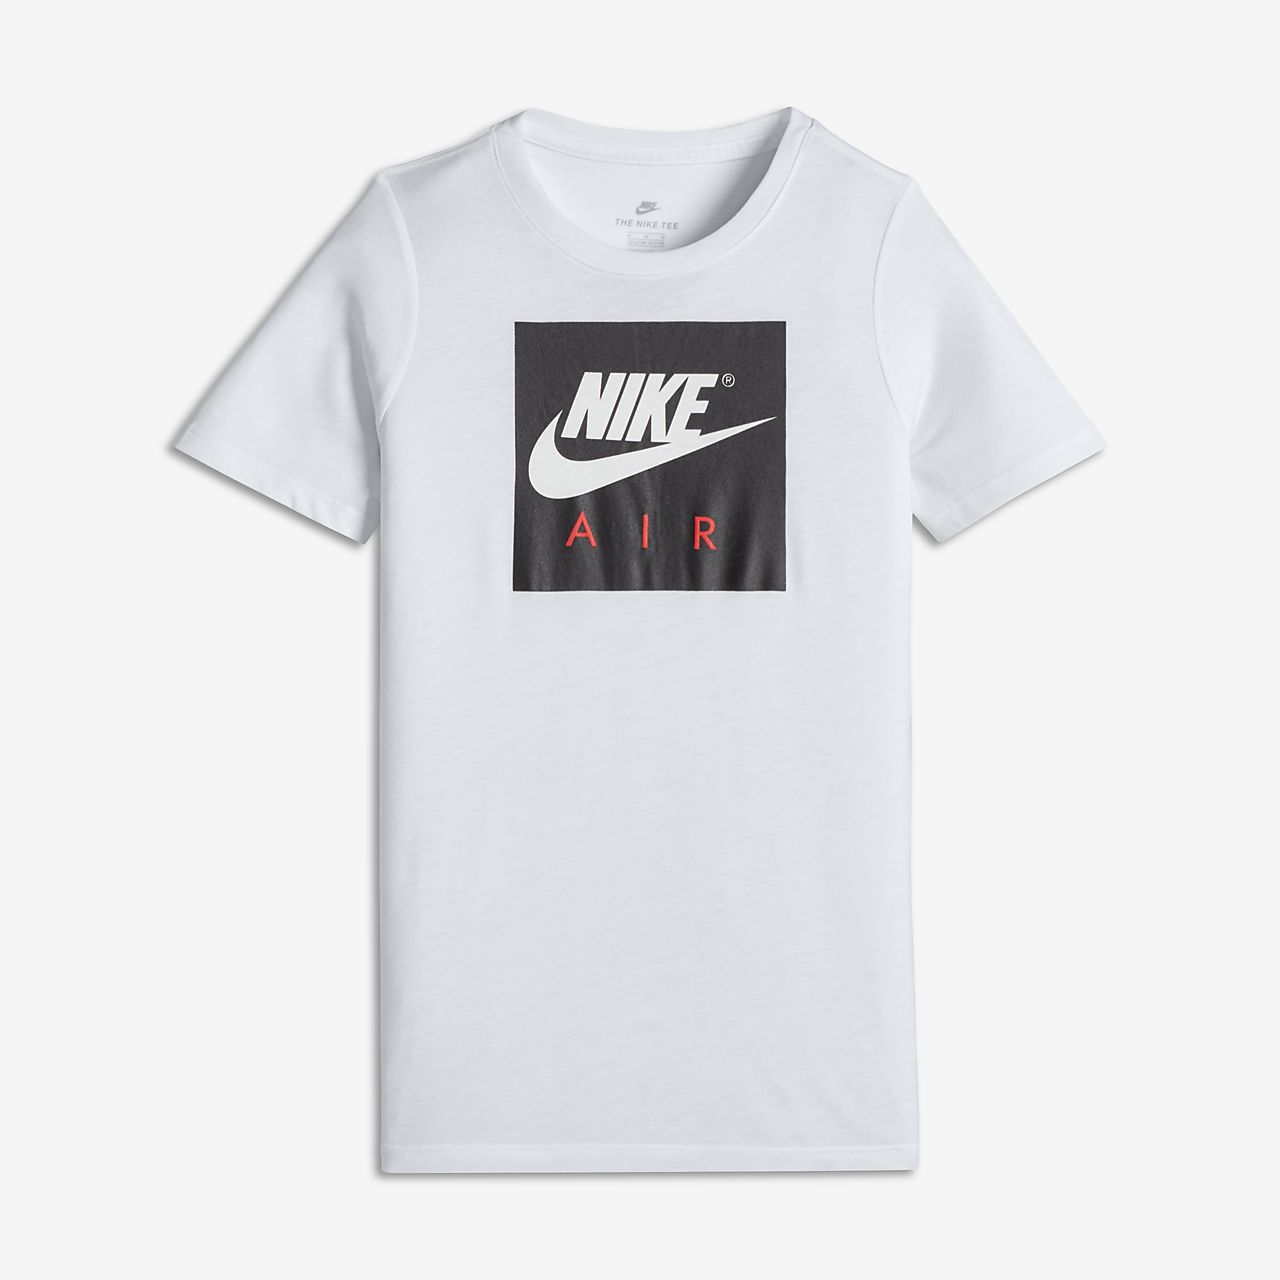 nike t-shirt mädchen 158